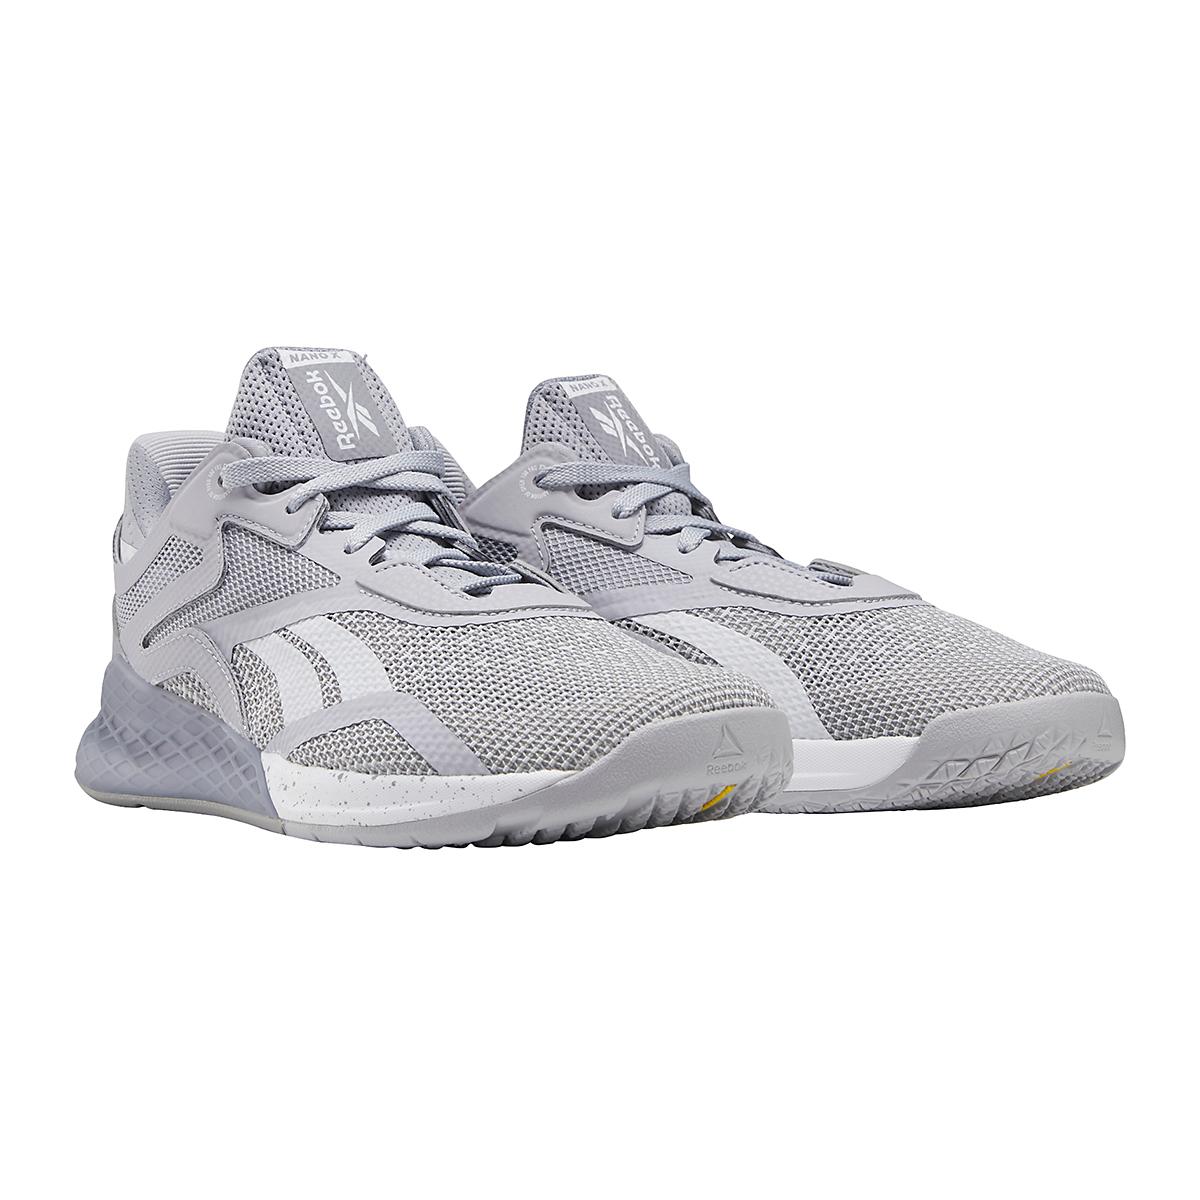 Women's Reebok Nano X Training Shoe - Color: Cold Grey/Cool Shadow/White - Size: 5 - Width: Regular, Cold Grey/Cool Shadow/White, large, image 3